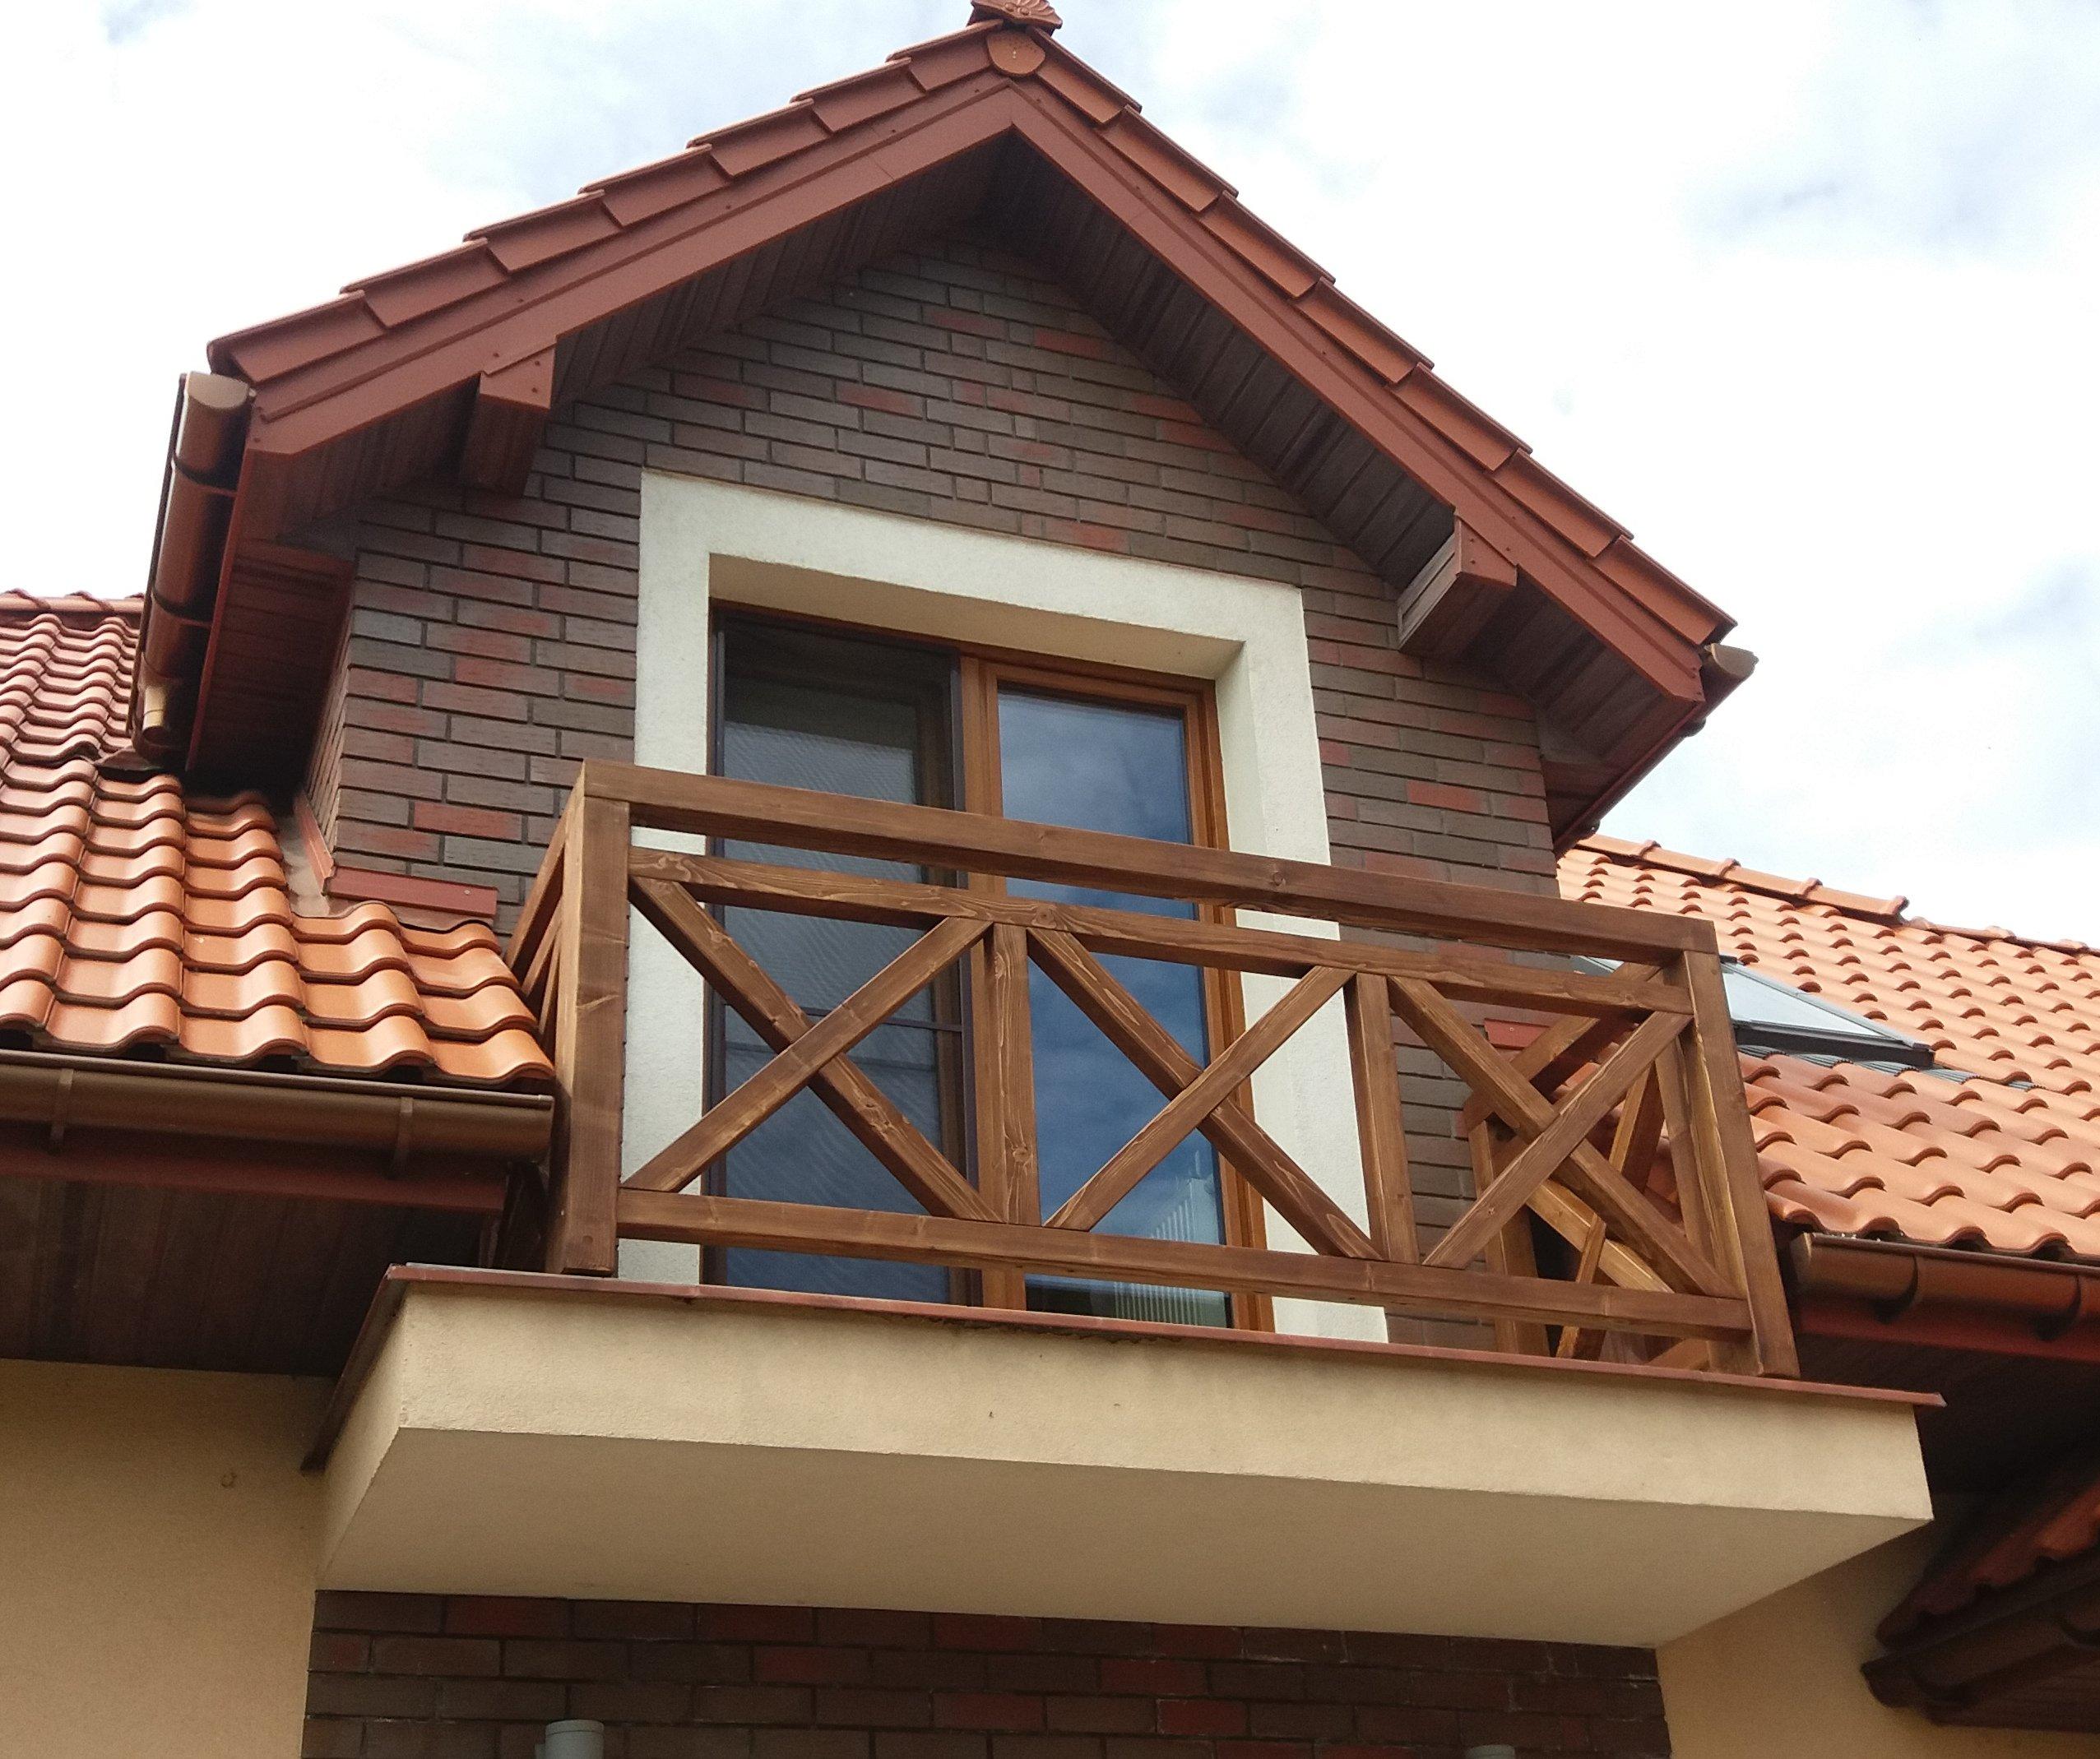 Barierki Drewniane Balustrady Balkonowe Barierki